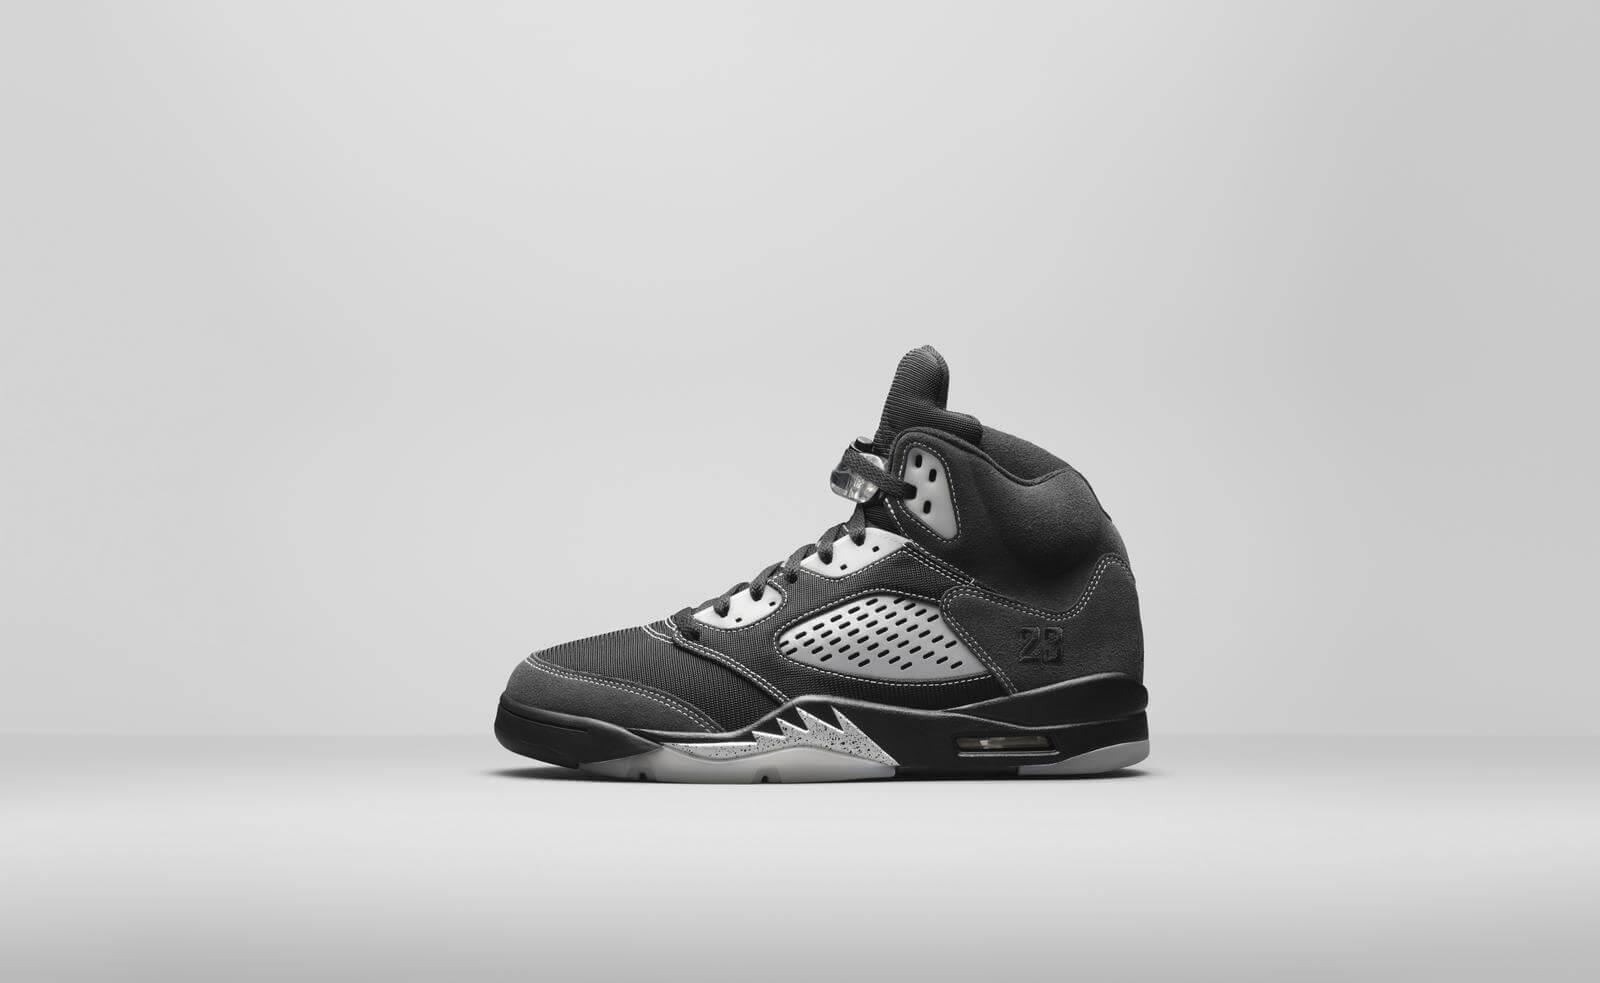 Air Jordan 5 reflective